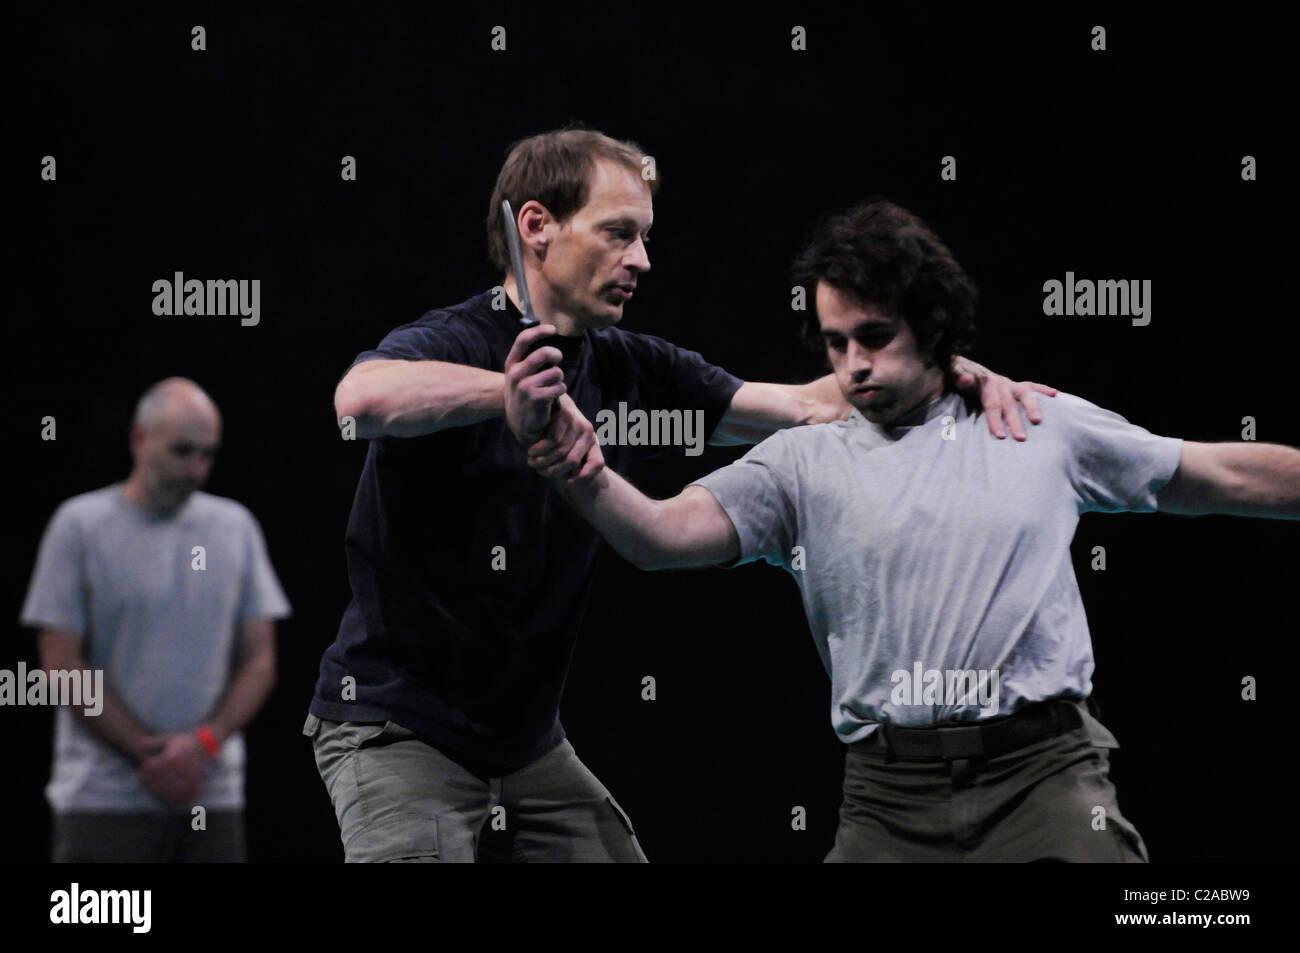 Systema with Martin Wheeler at Festival des Arts Martiaux de Bercy, Paris. - Stock Image